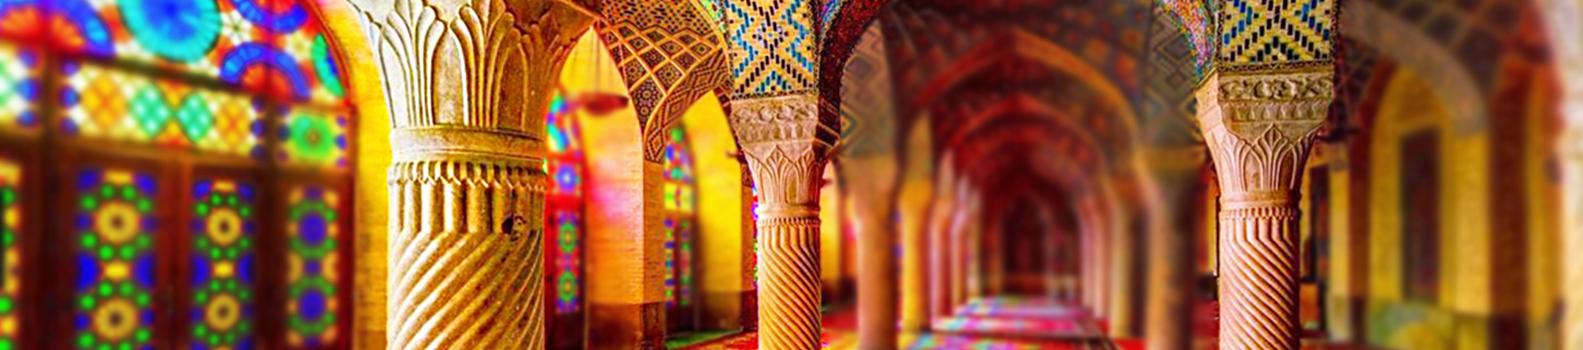 To iran,Iran Cultural tour,Iran Culture